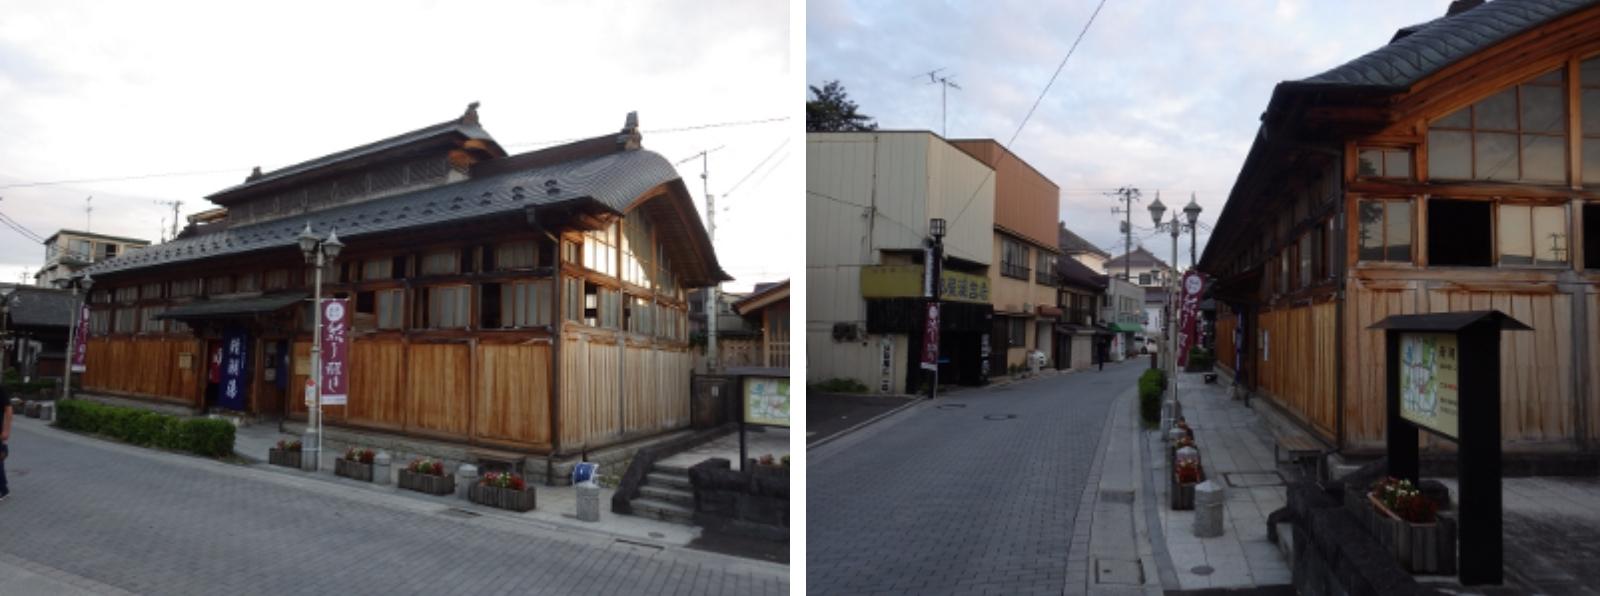 fukushima-soundscapes-koji-nagahata-120811